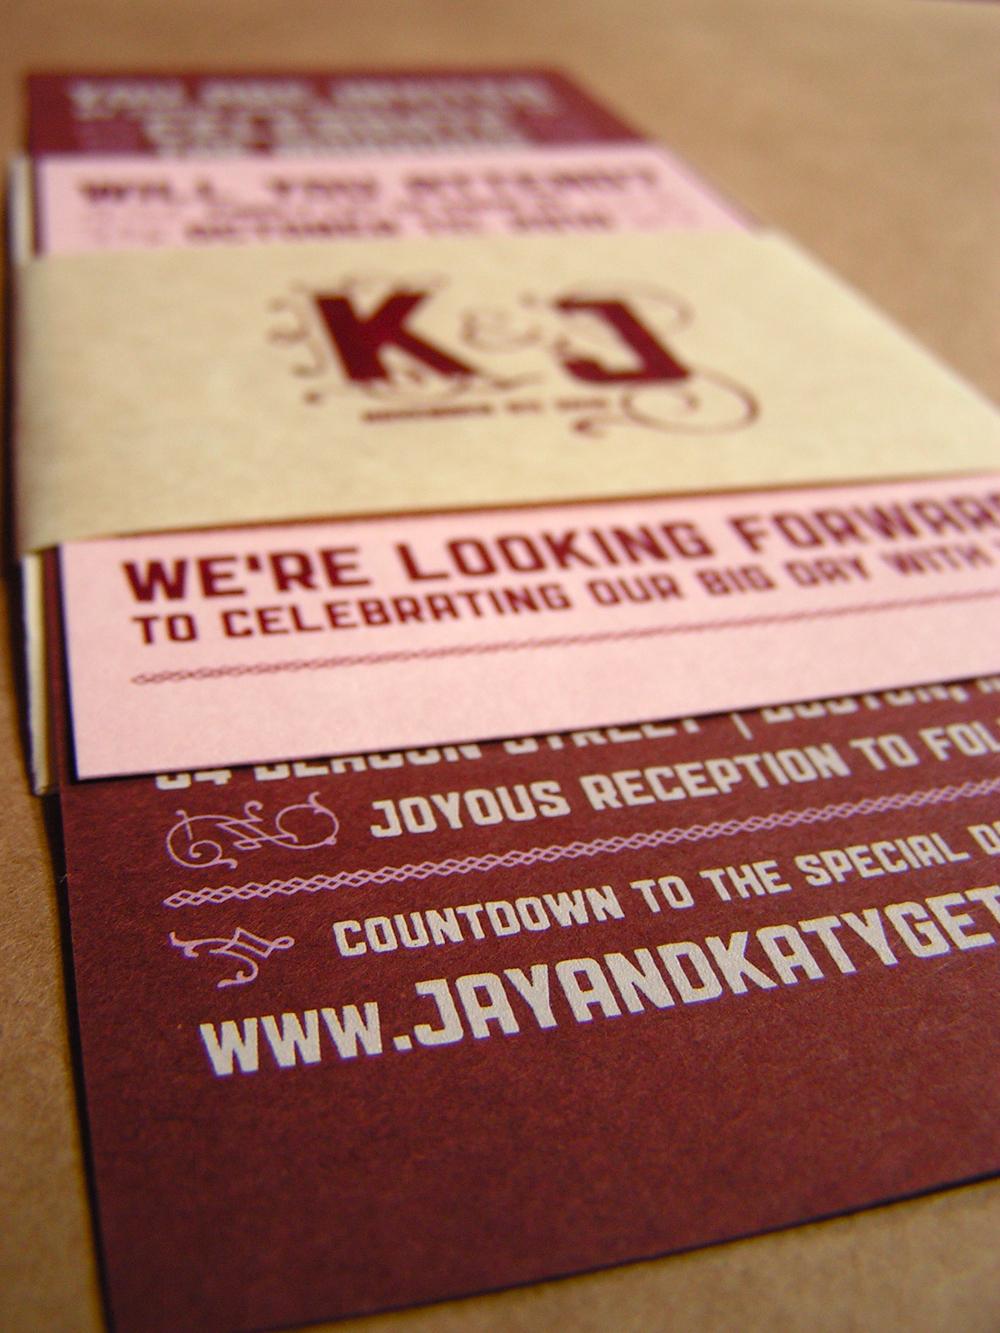 screen print wedding invites wedding invitations printing 25 best images about Screen print wedding invites on Pinterest Invitations Invitation ideas and Wedding stuff